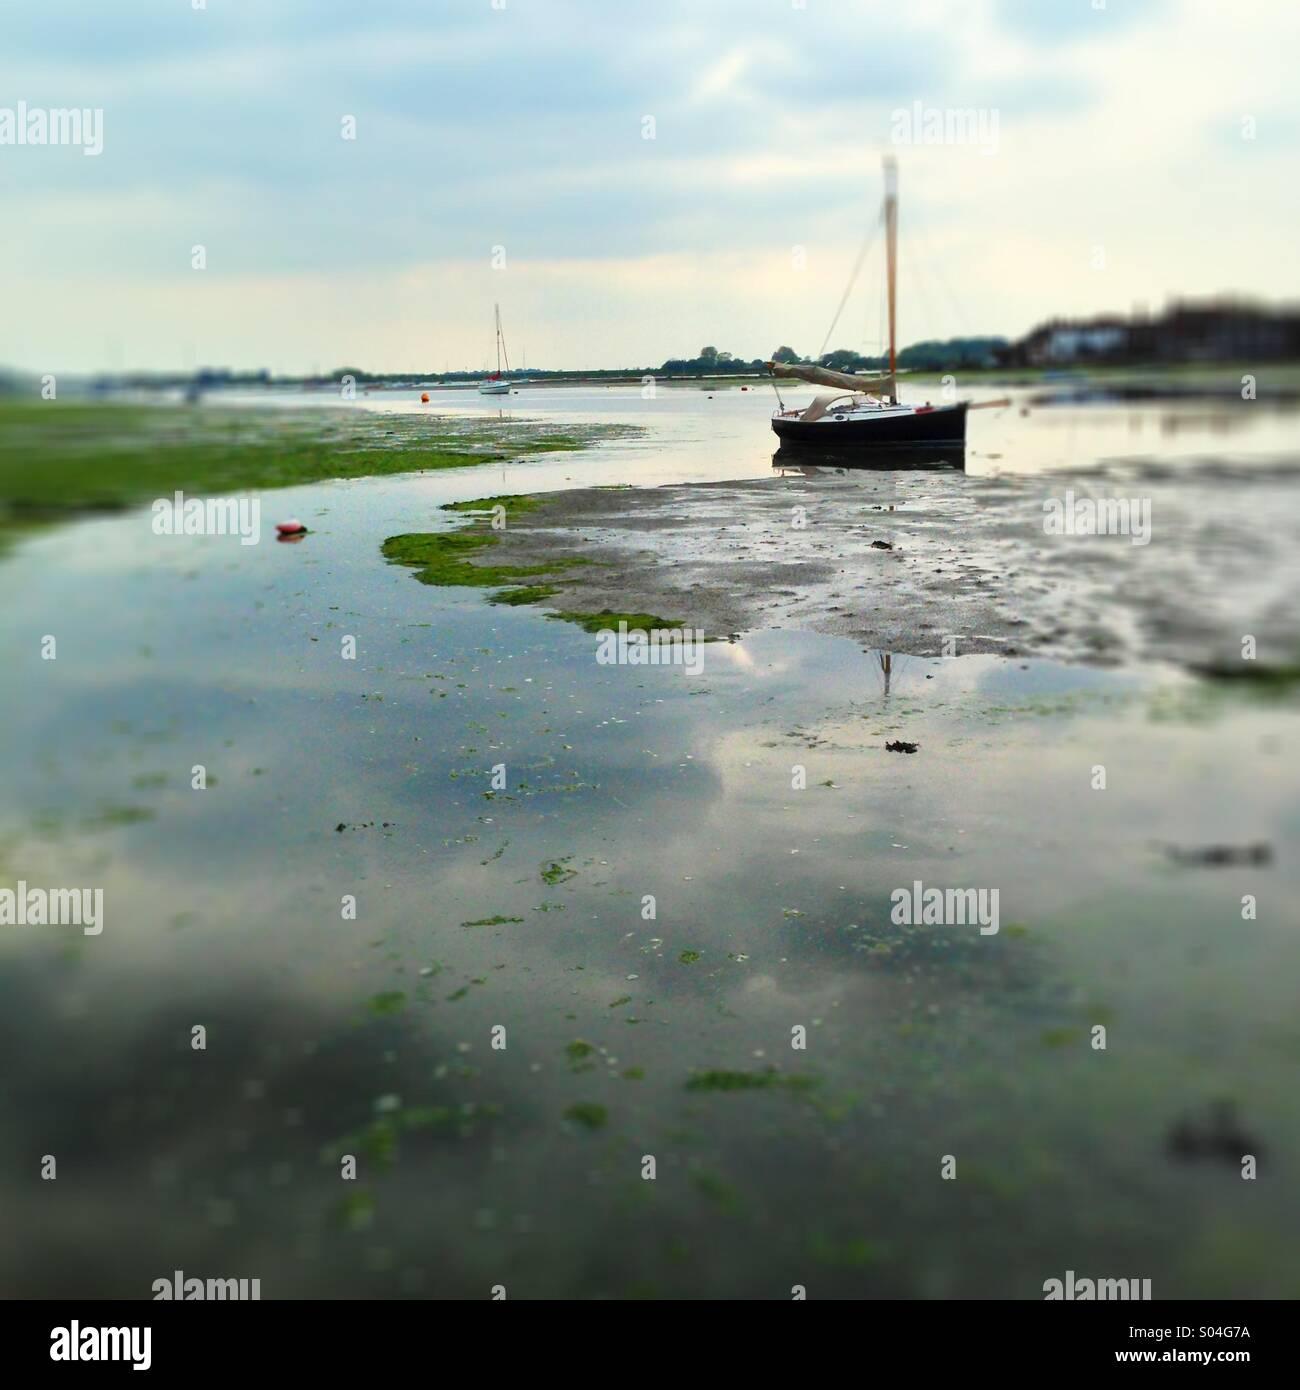 Sailing boat at low tide in tidal estuary. Stock Photo